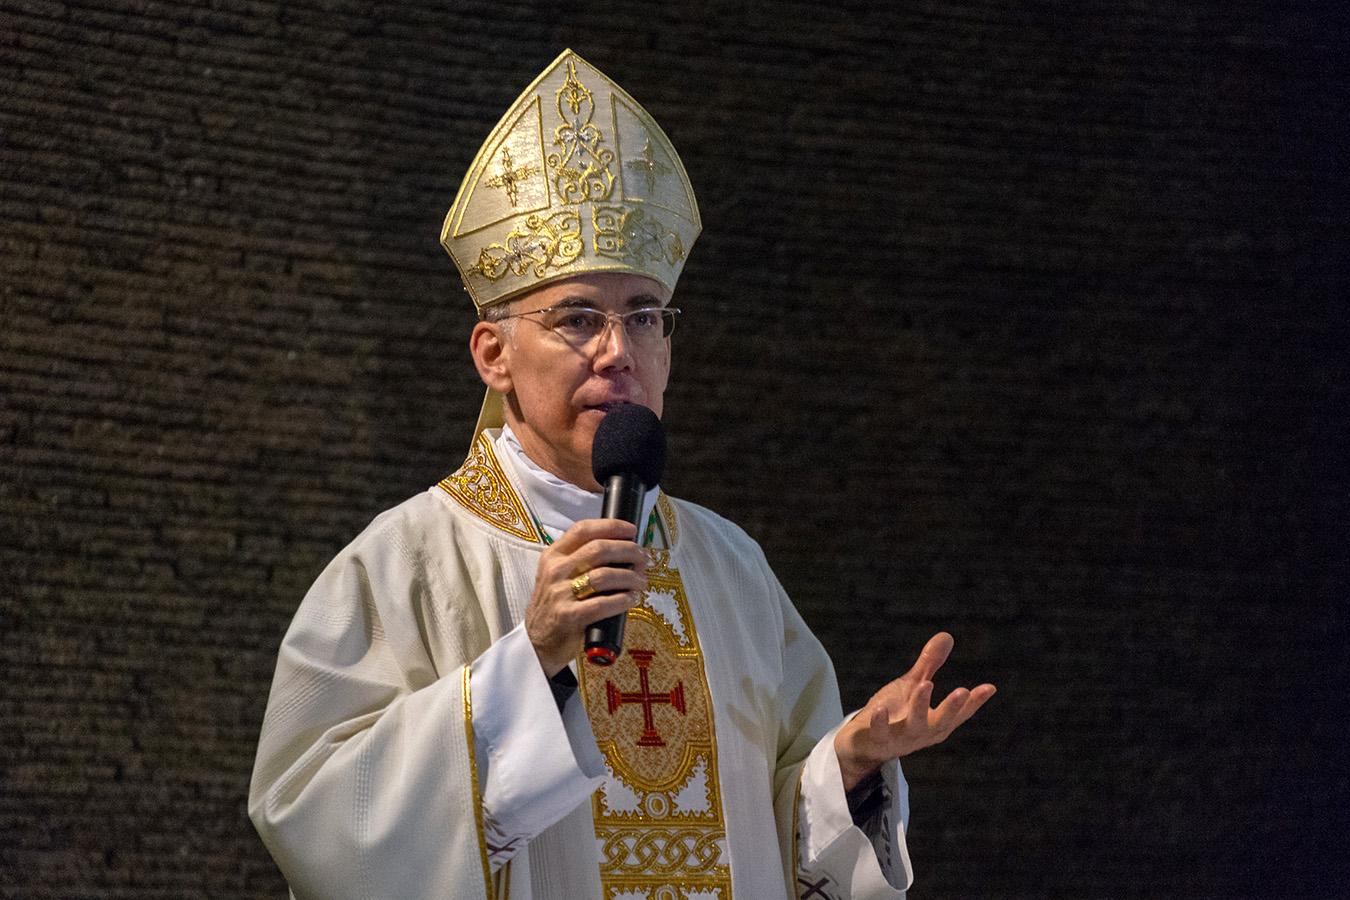 'If coronavirus is contagious, so is good' — Pope's envoy